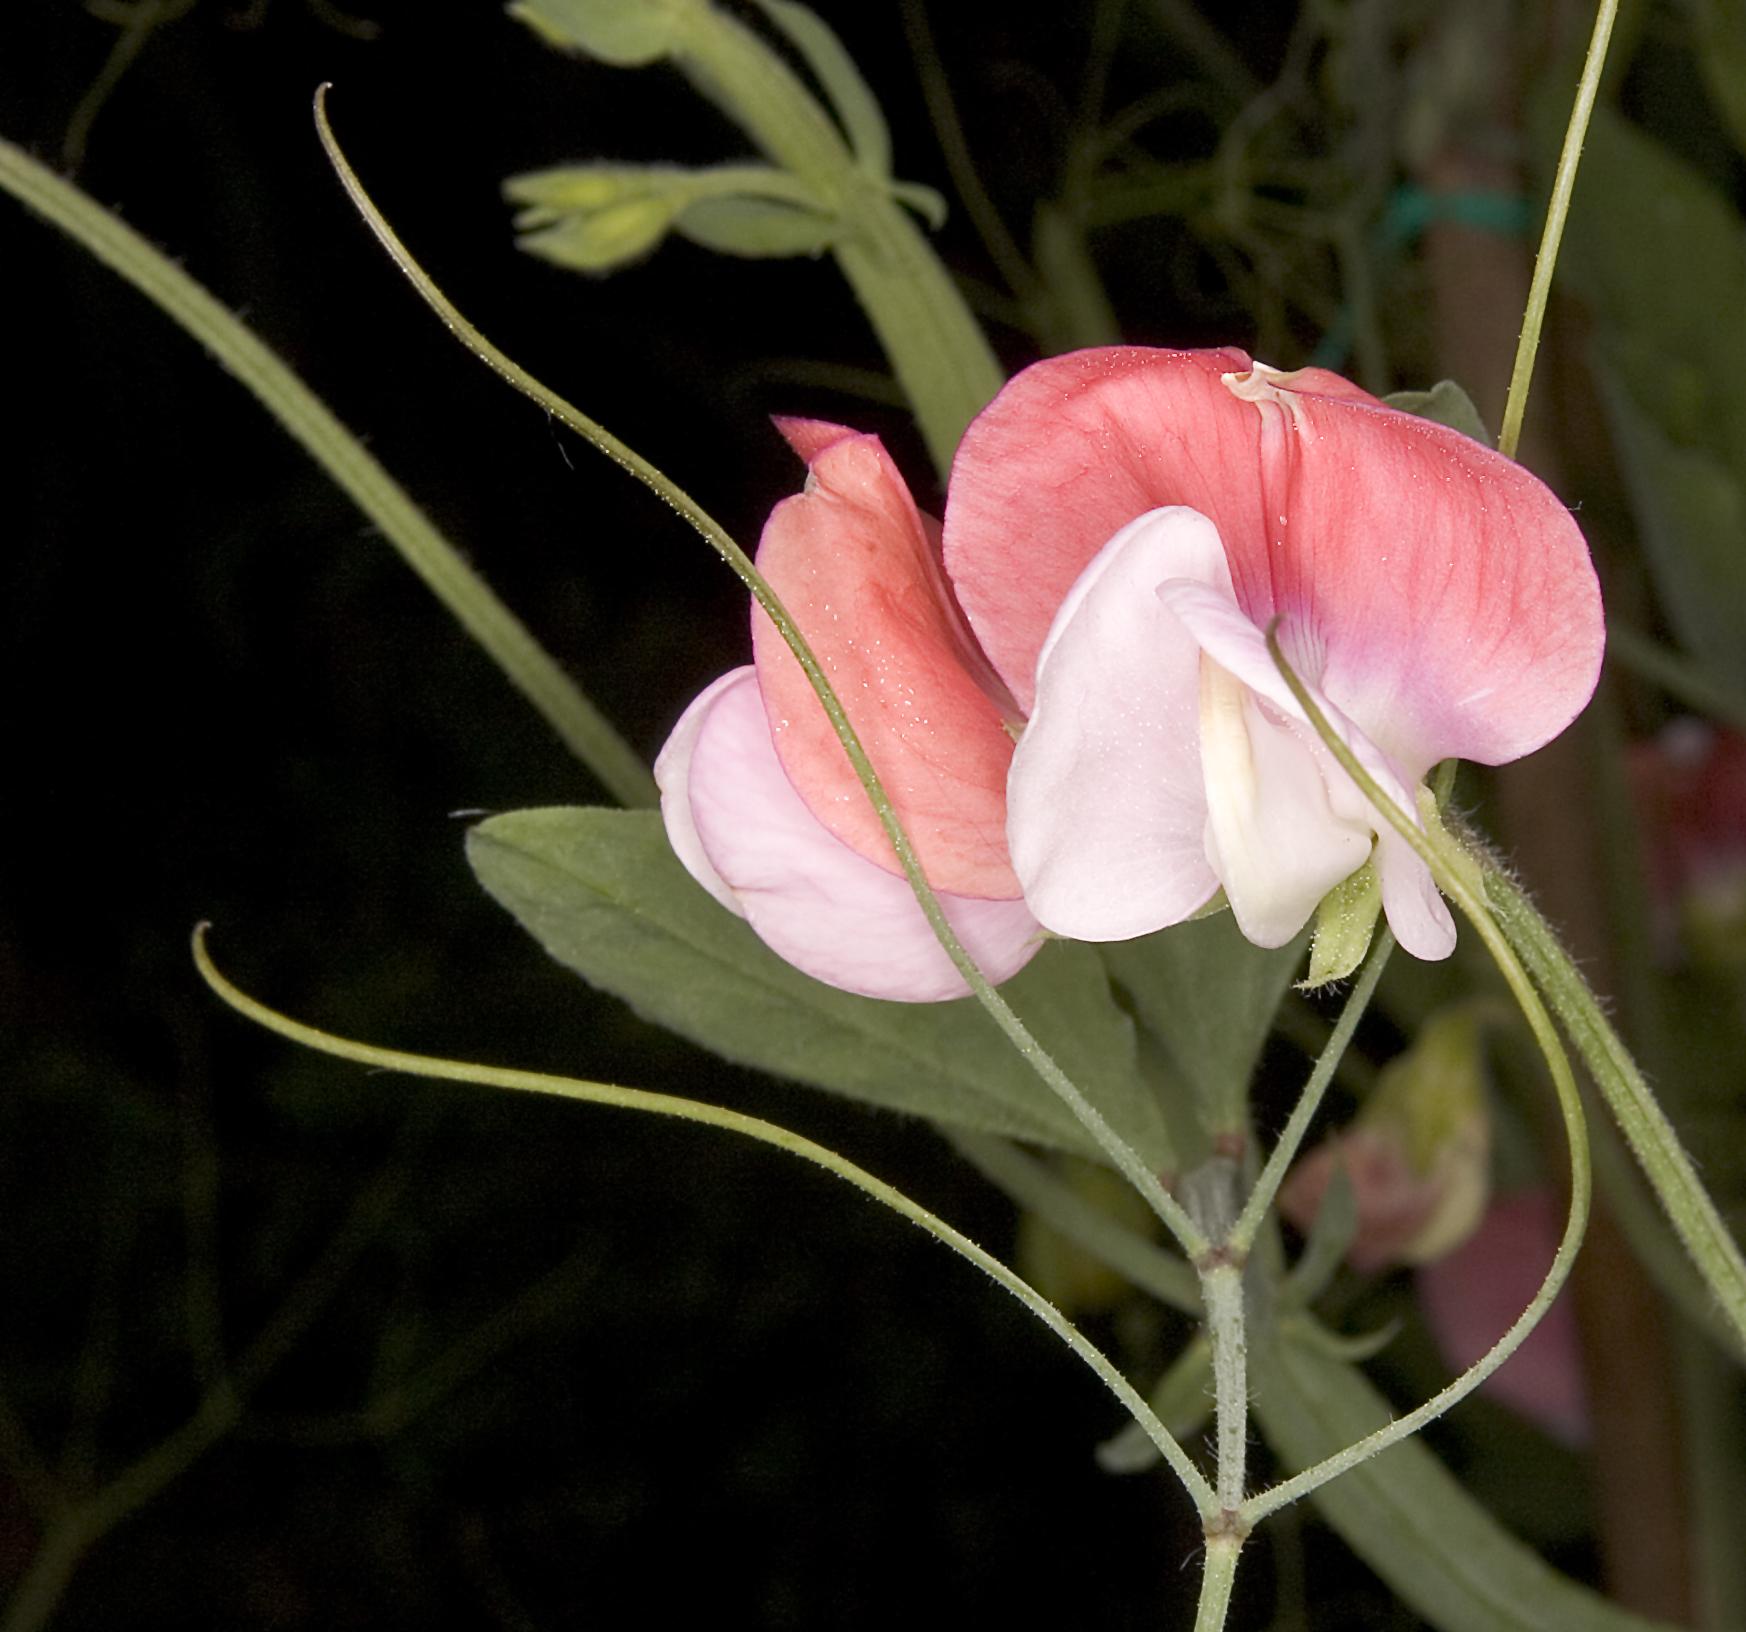 Bezelye çiçeği bezelye çiçeği